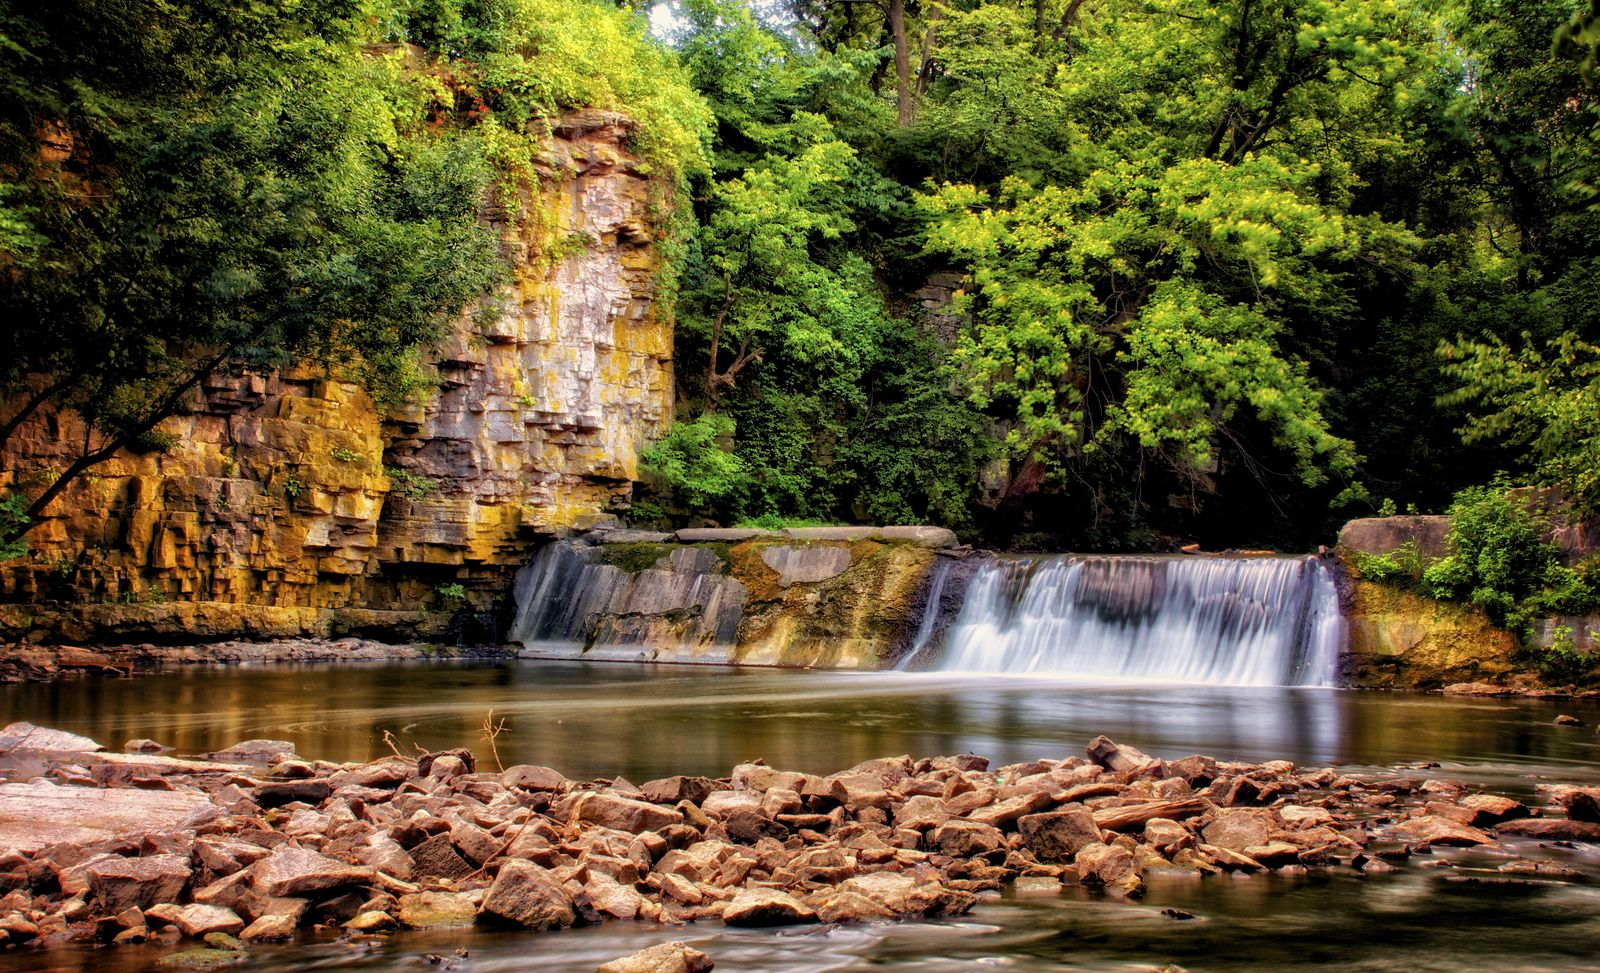 Willow Creek Waterfall - Mason City, IA   Weekend road ...